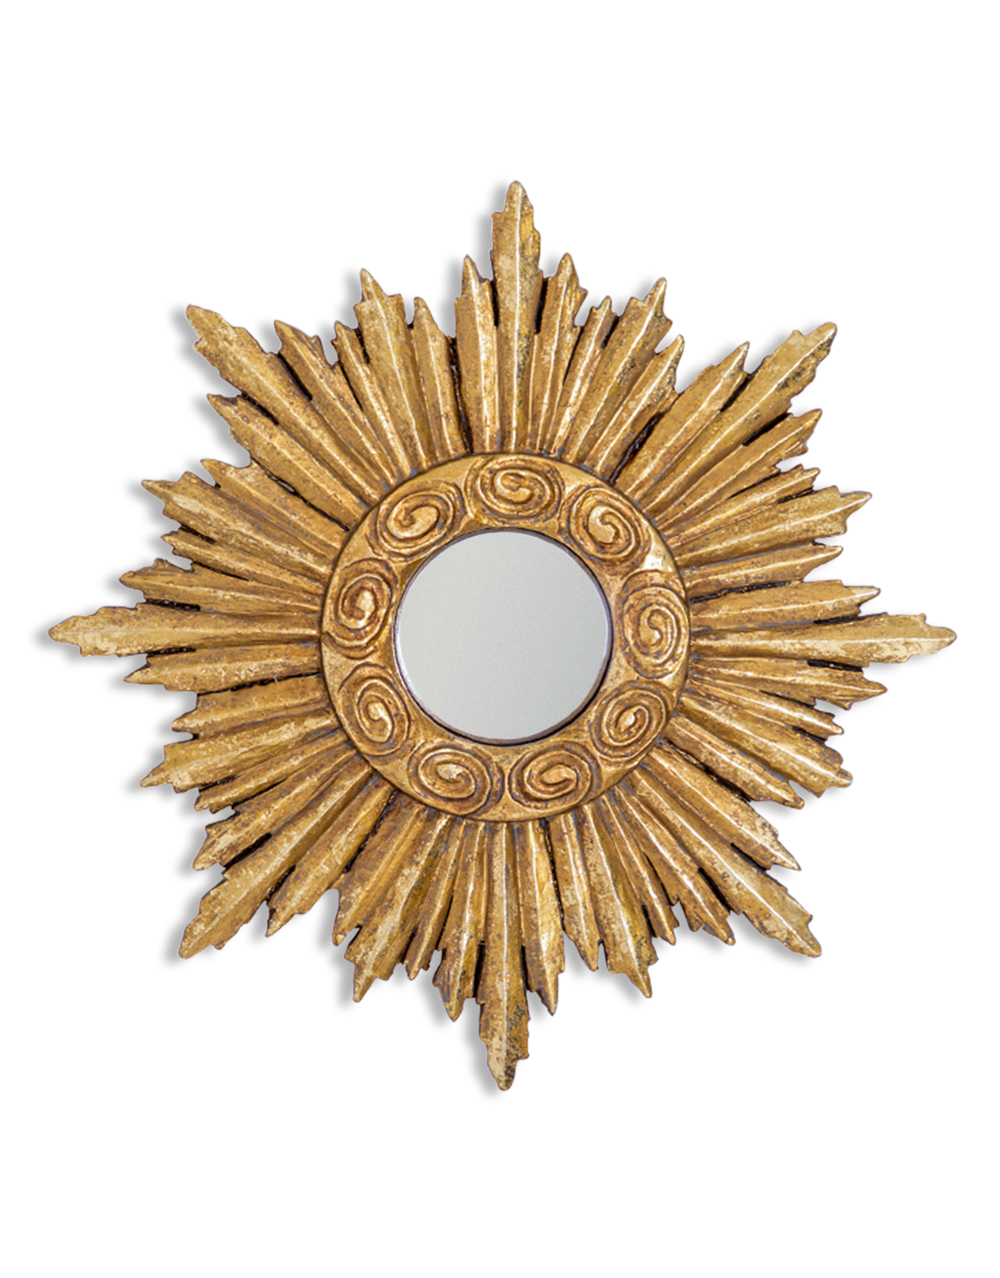 Antique Gold Convex Star Mirror